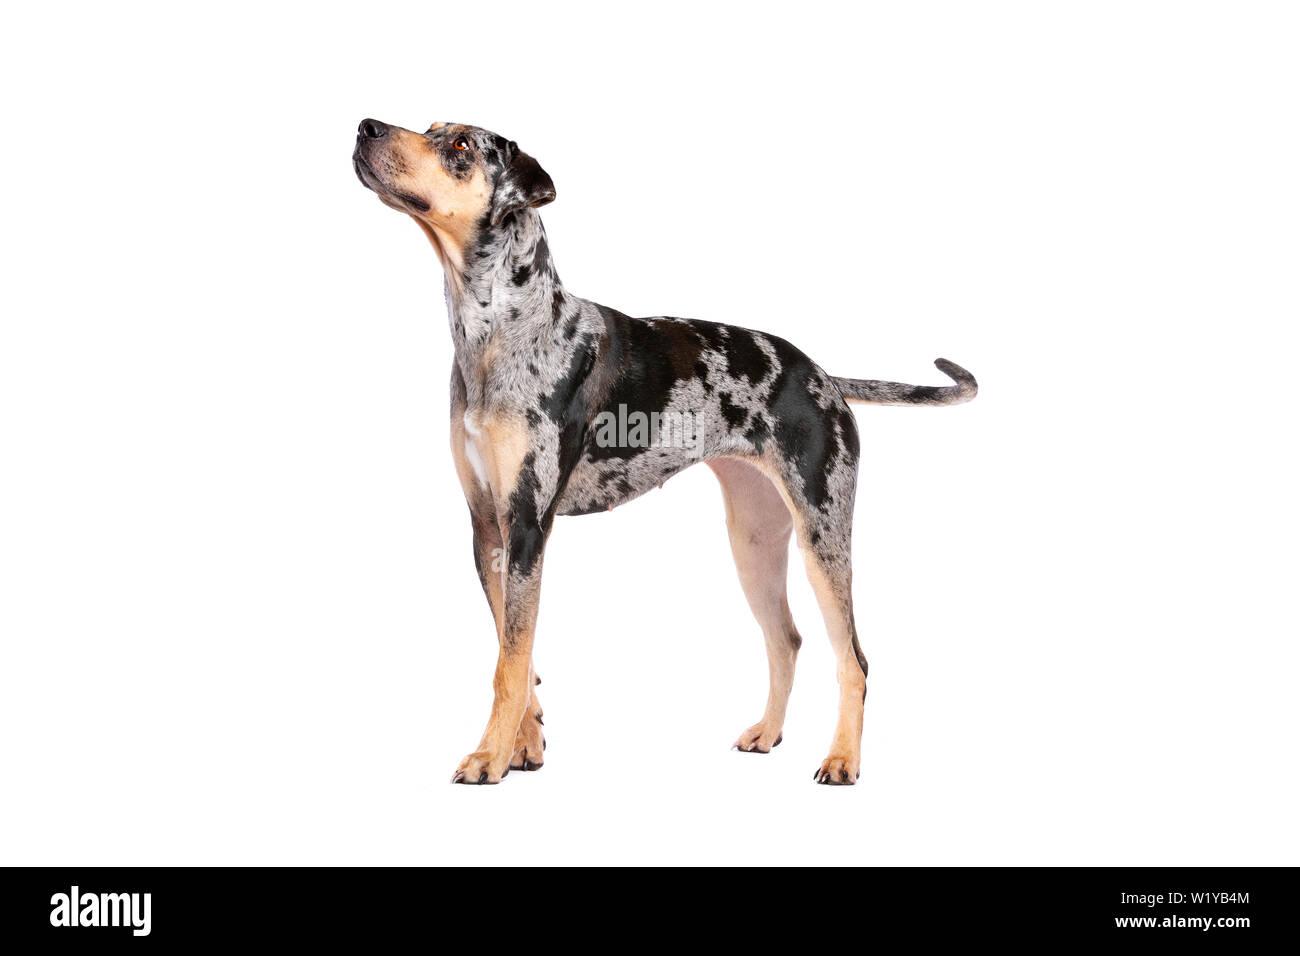 Catahoula Leopard Dog Stock Photos & Catahoula Leopard Dog Stock